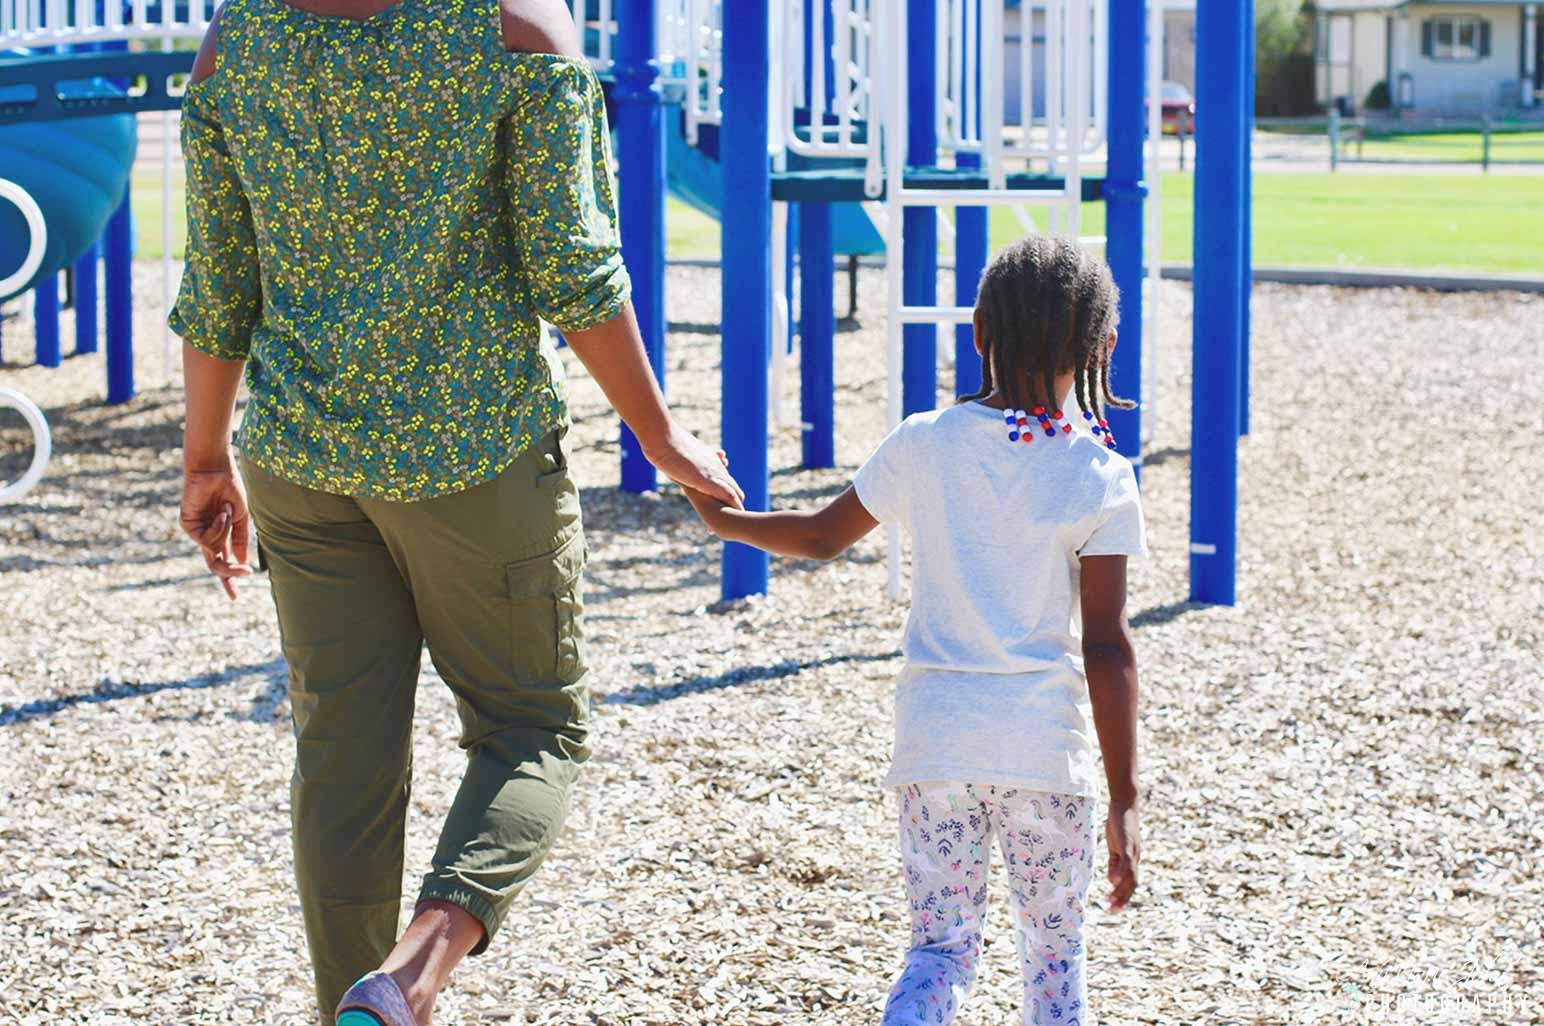 Parenting holding chiild's hand